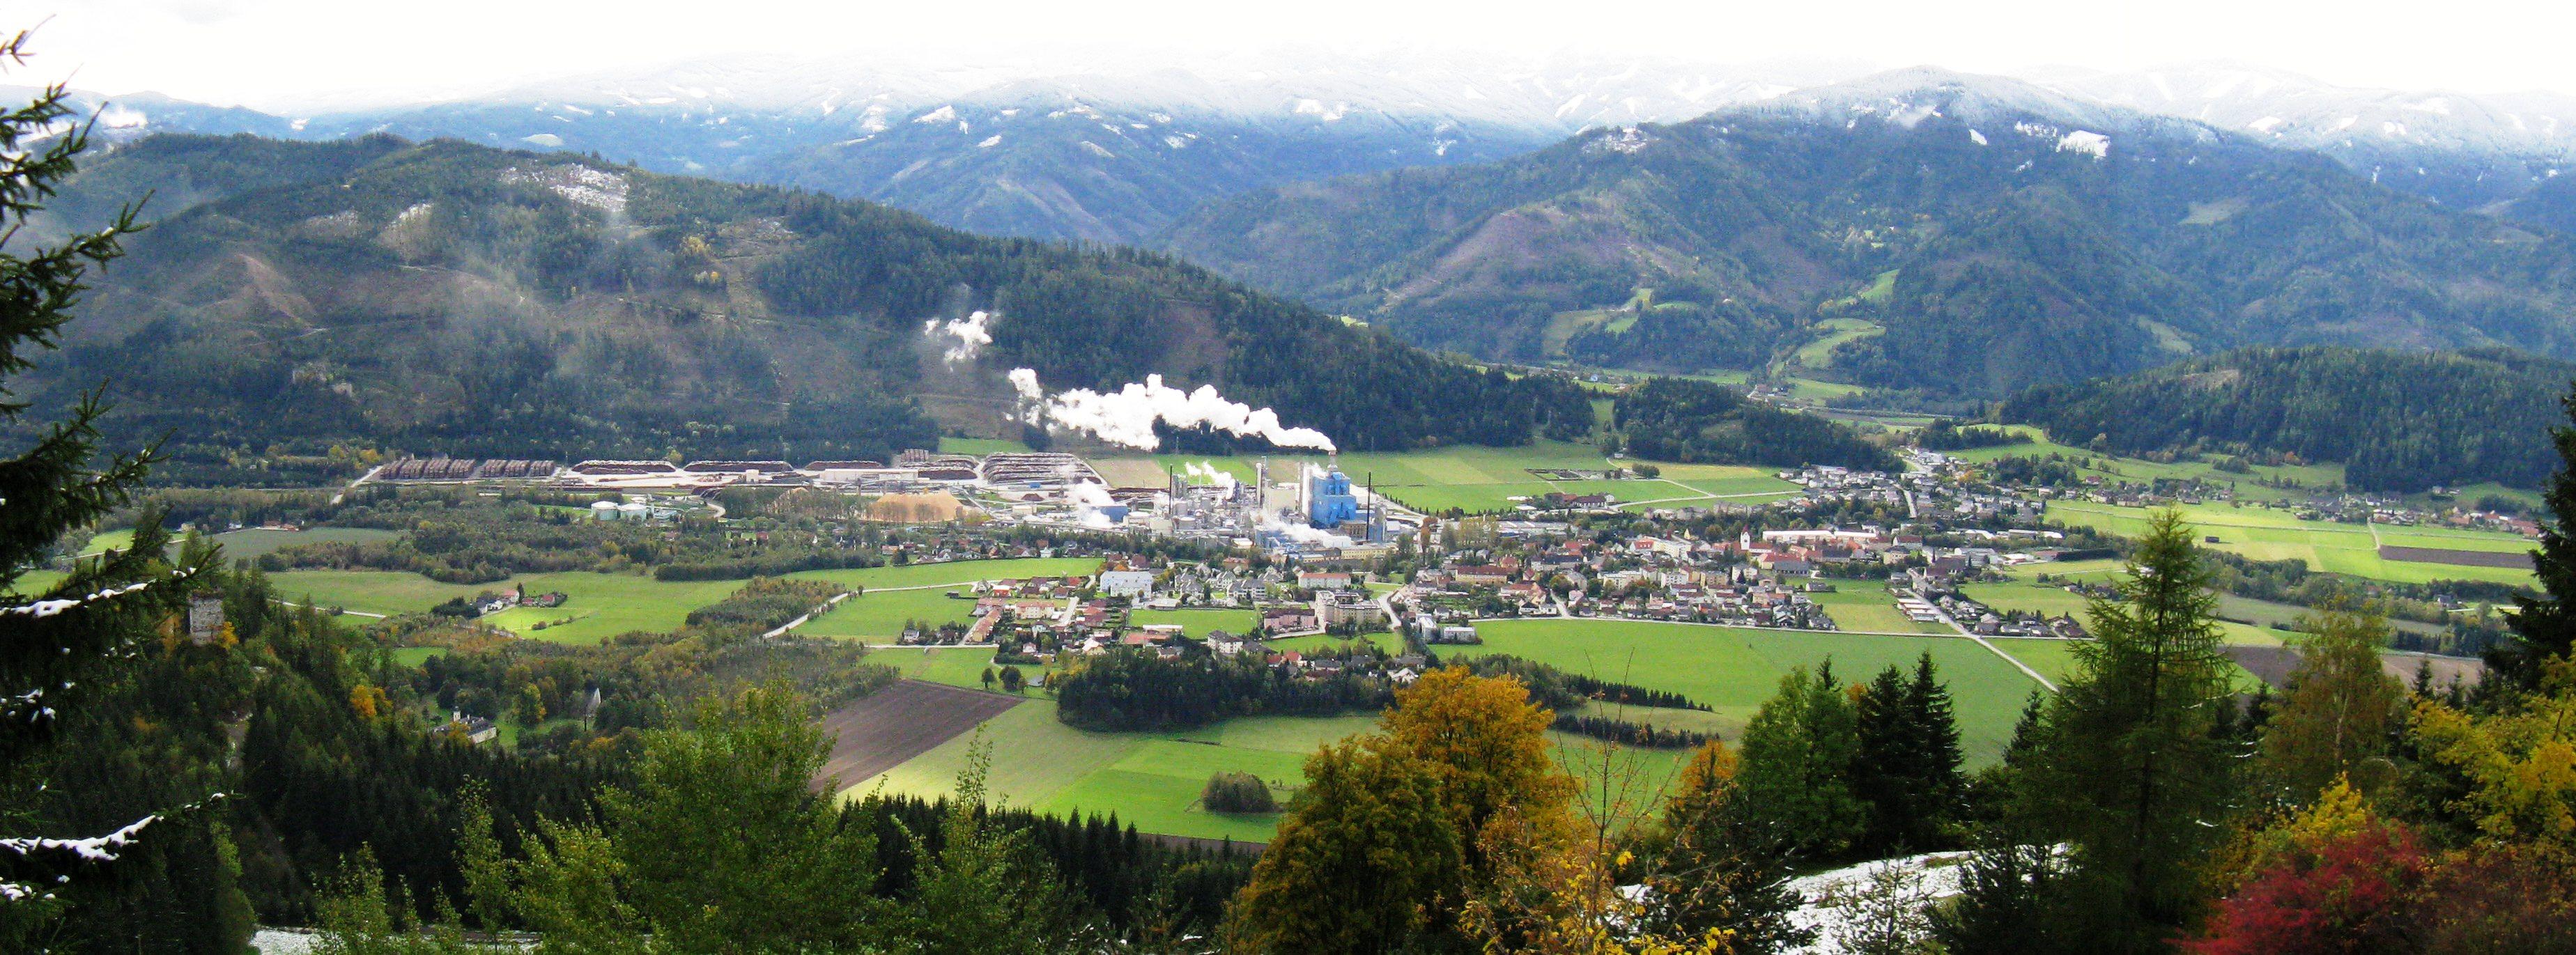 Treffen singles aus bad mitterndorf, Mayrhofen single frau